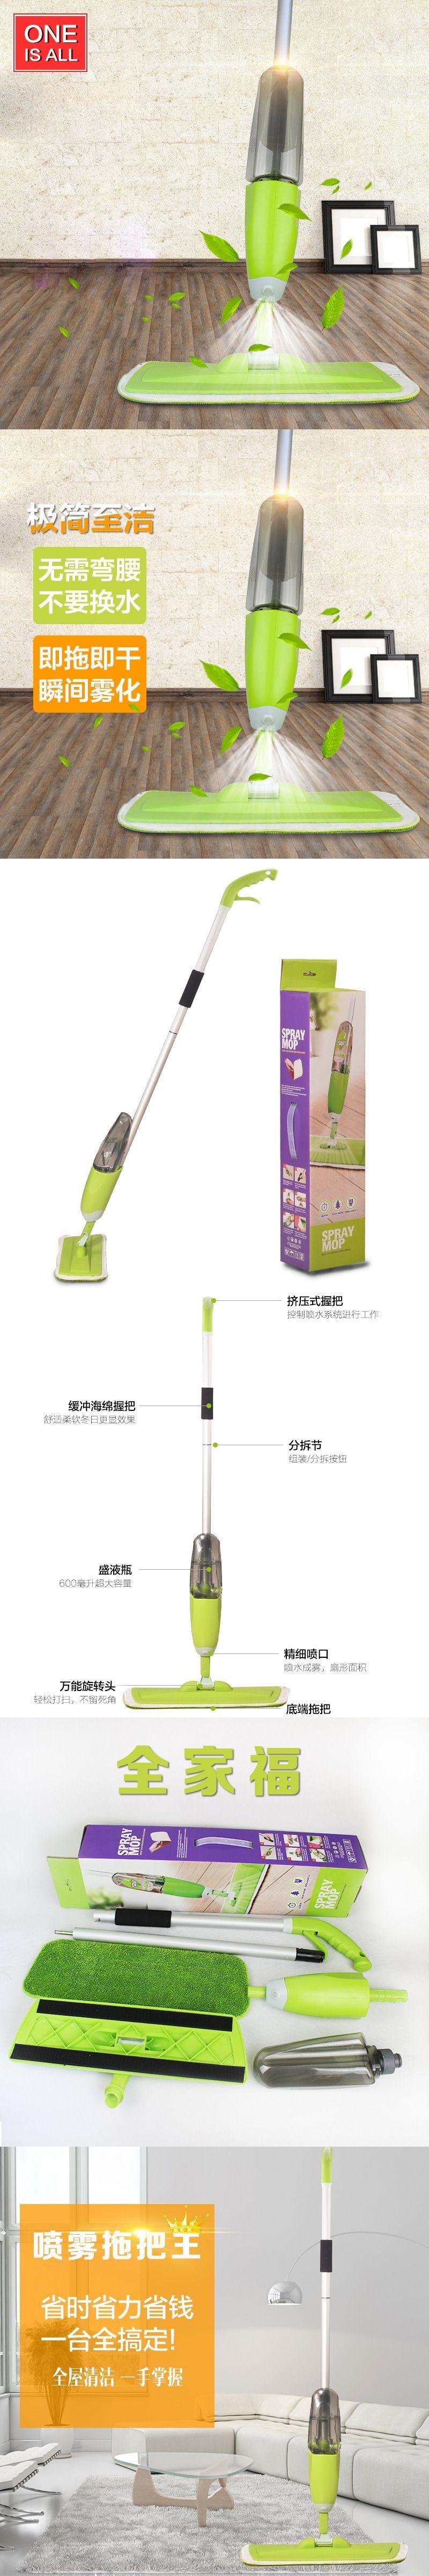 canada nellie shop wow mop mops s floor